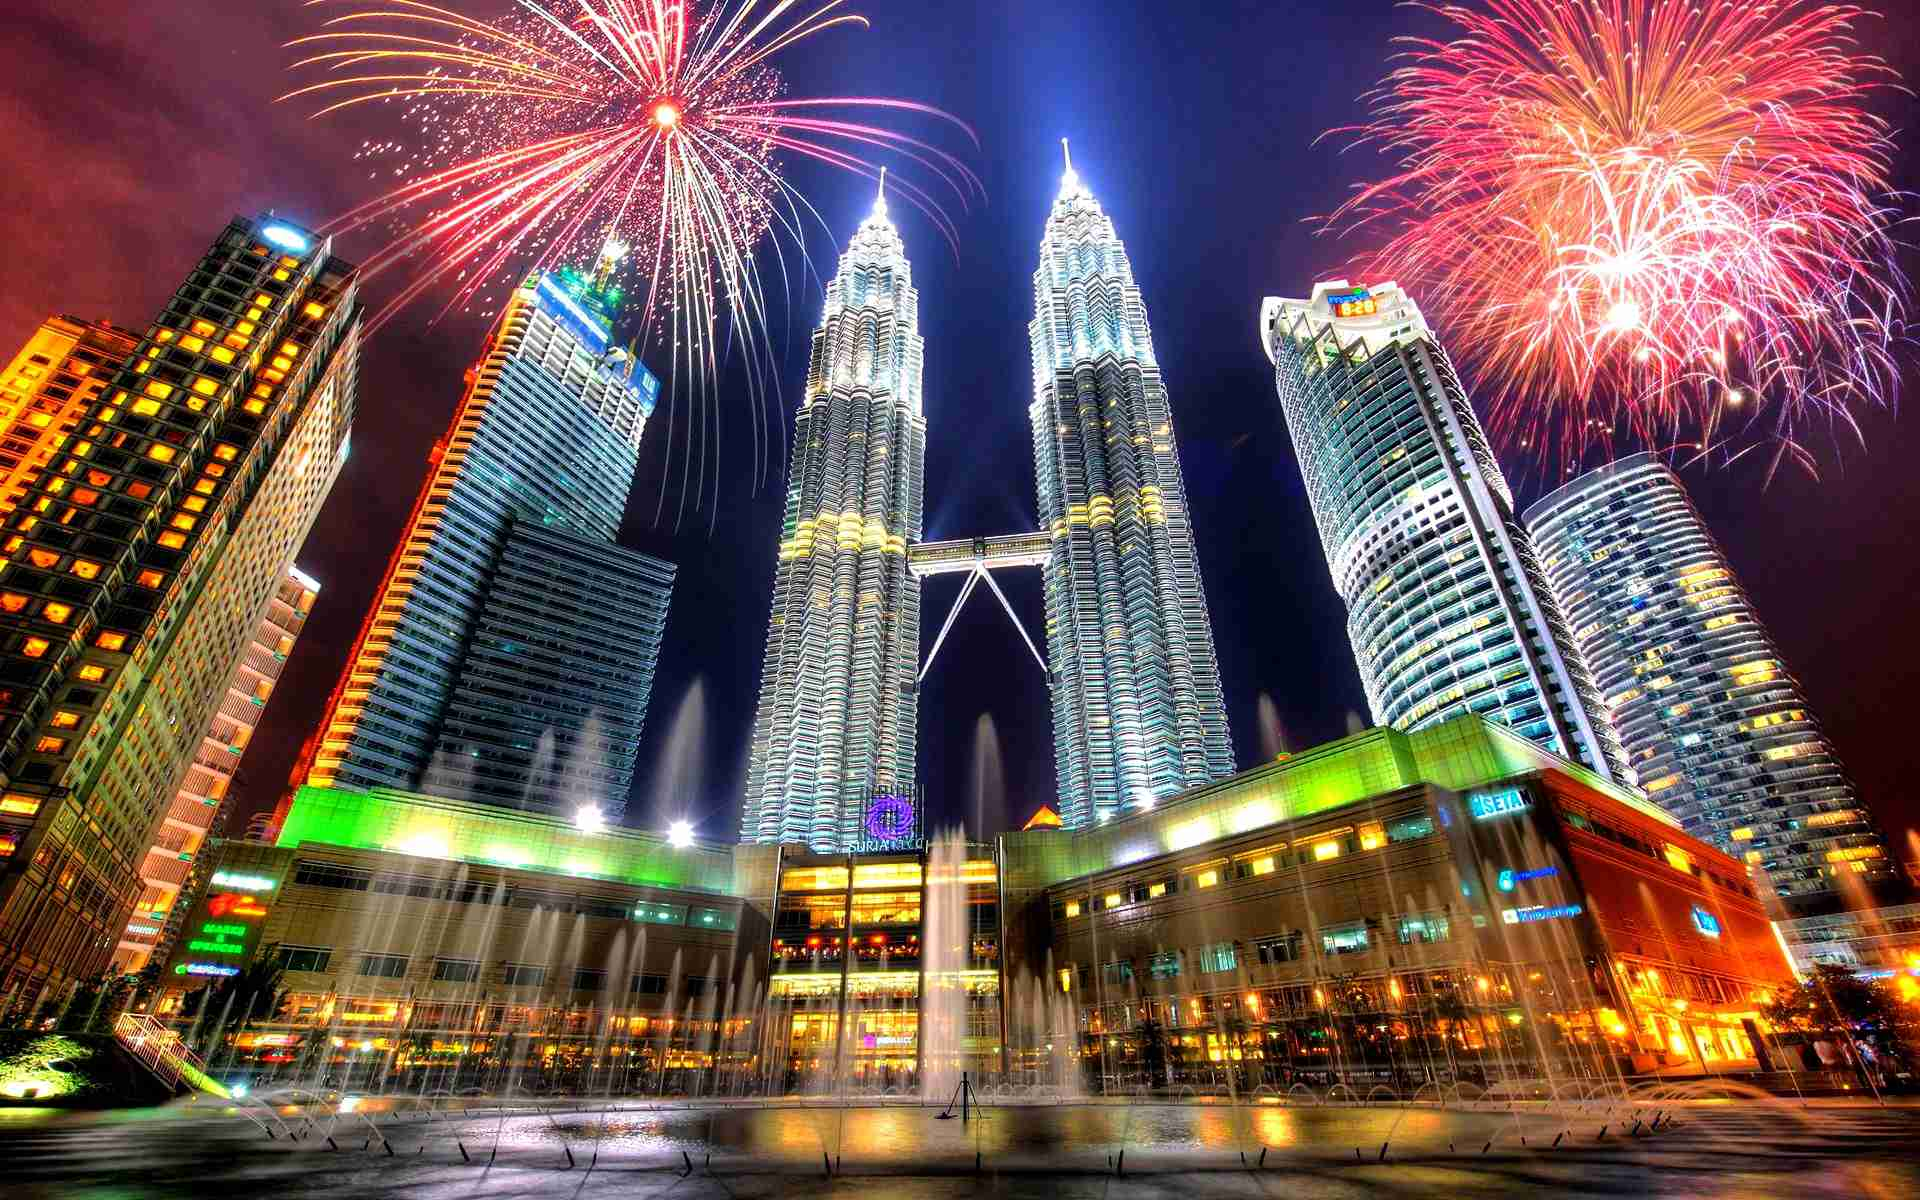 Malaysia High Quality Wallpaper 020552683 166